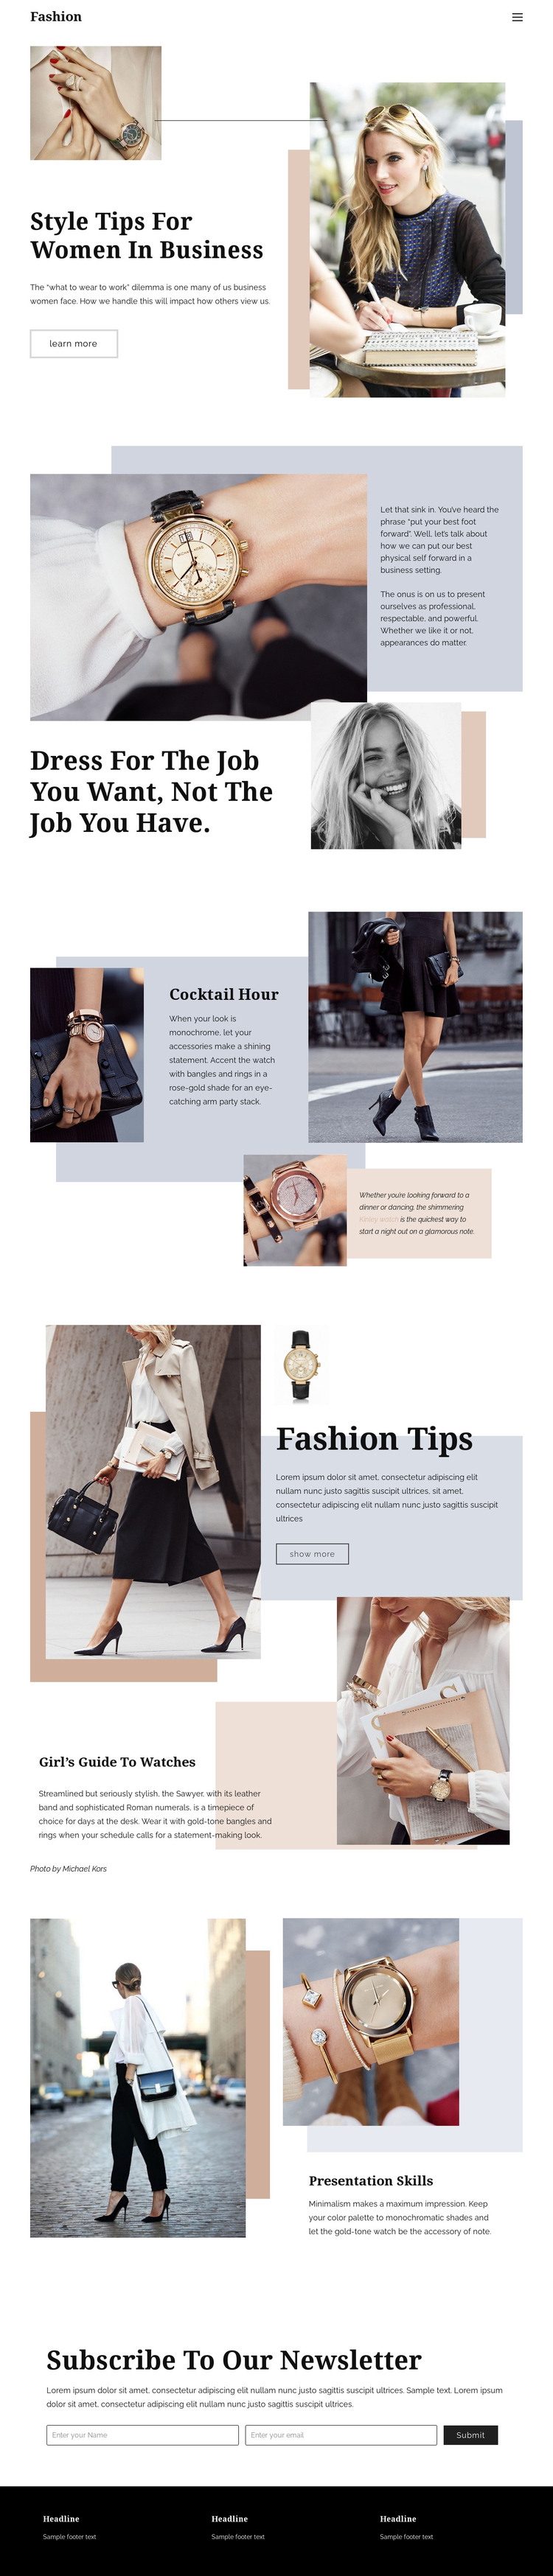 Fashion tips Homepage Design